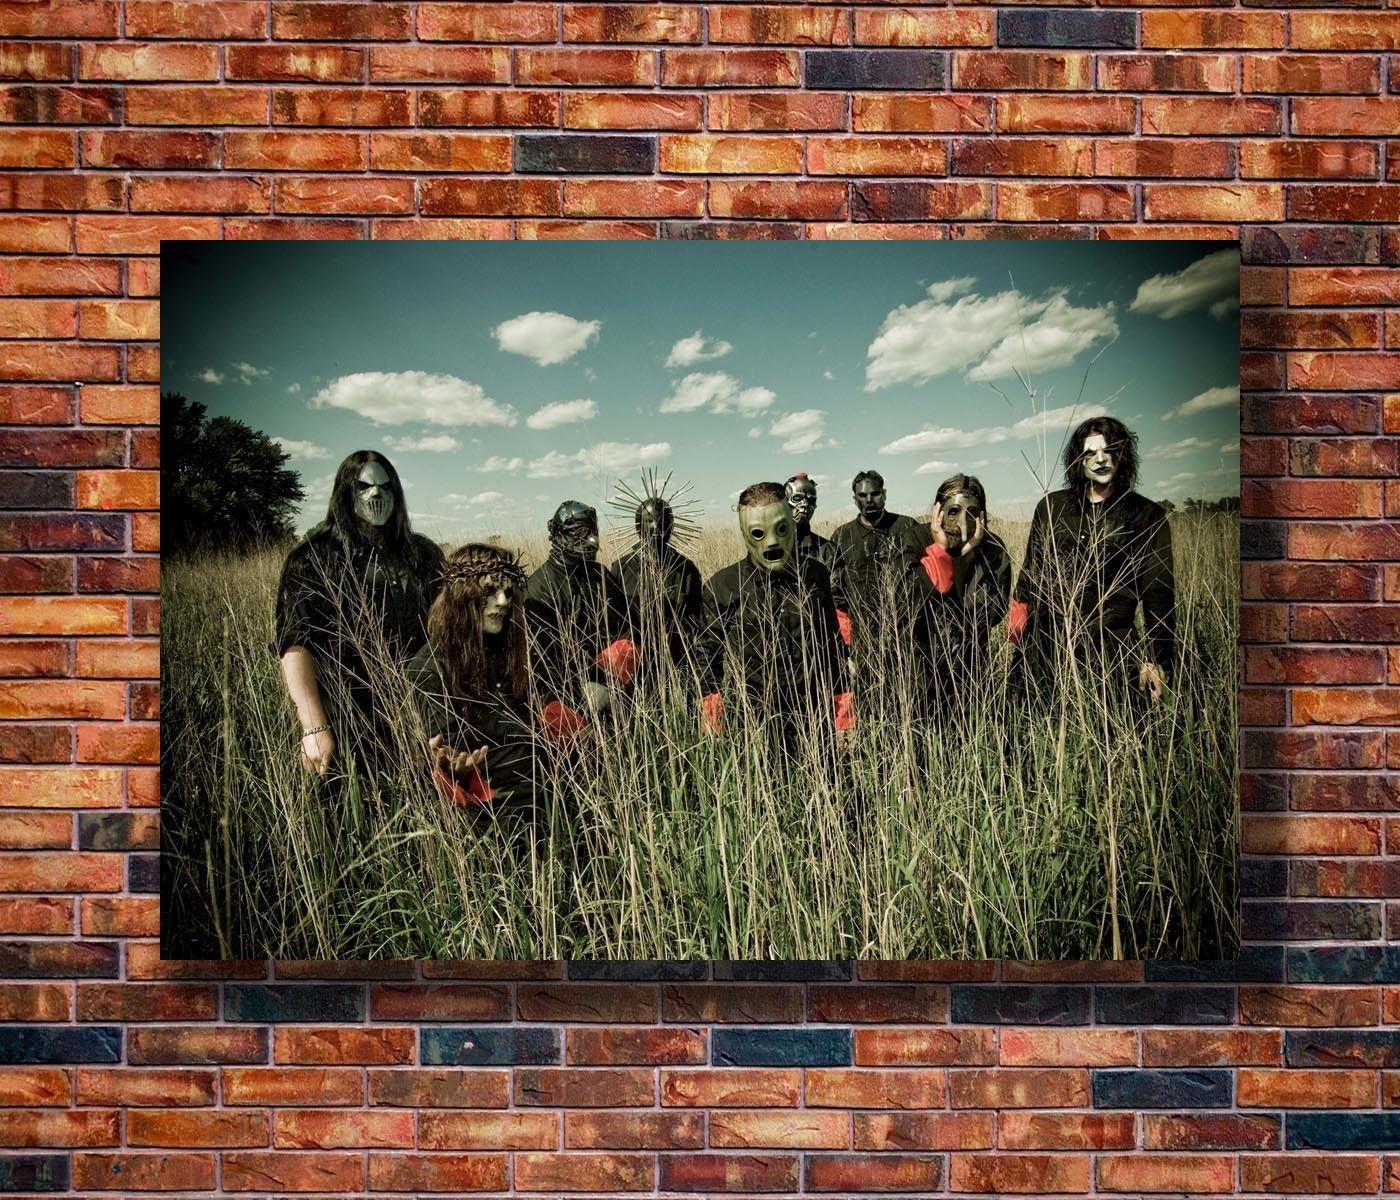 Q0146 carteles y huellas 20x30x24x36 Slipknot-banda de Heavy Metal Poster de Pop Art lona pintura decoración de hogar